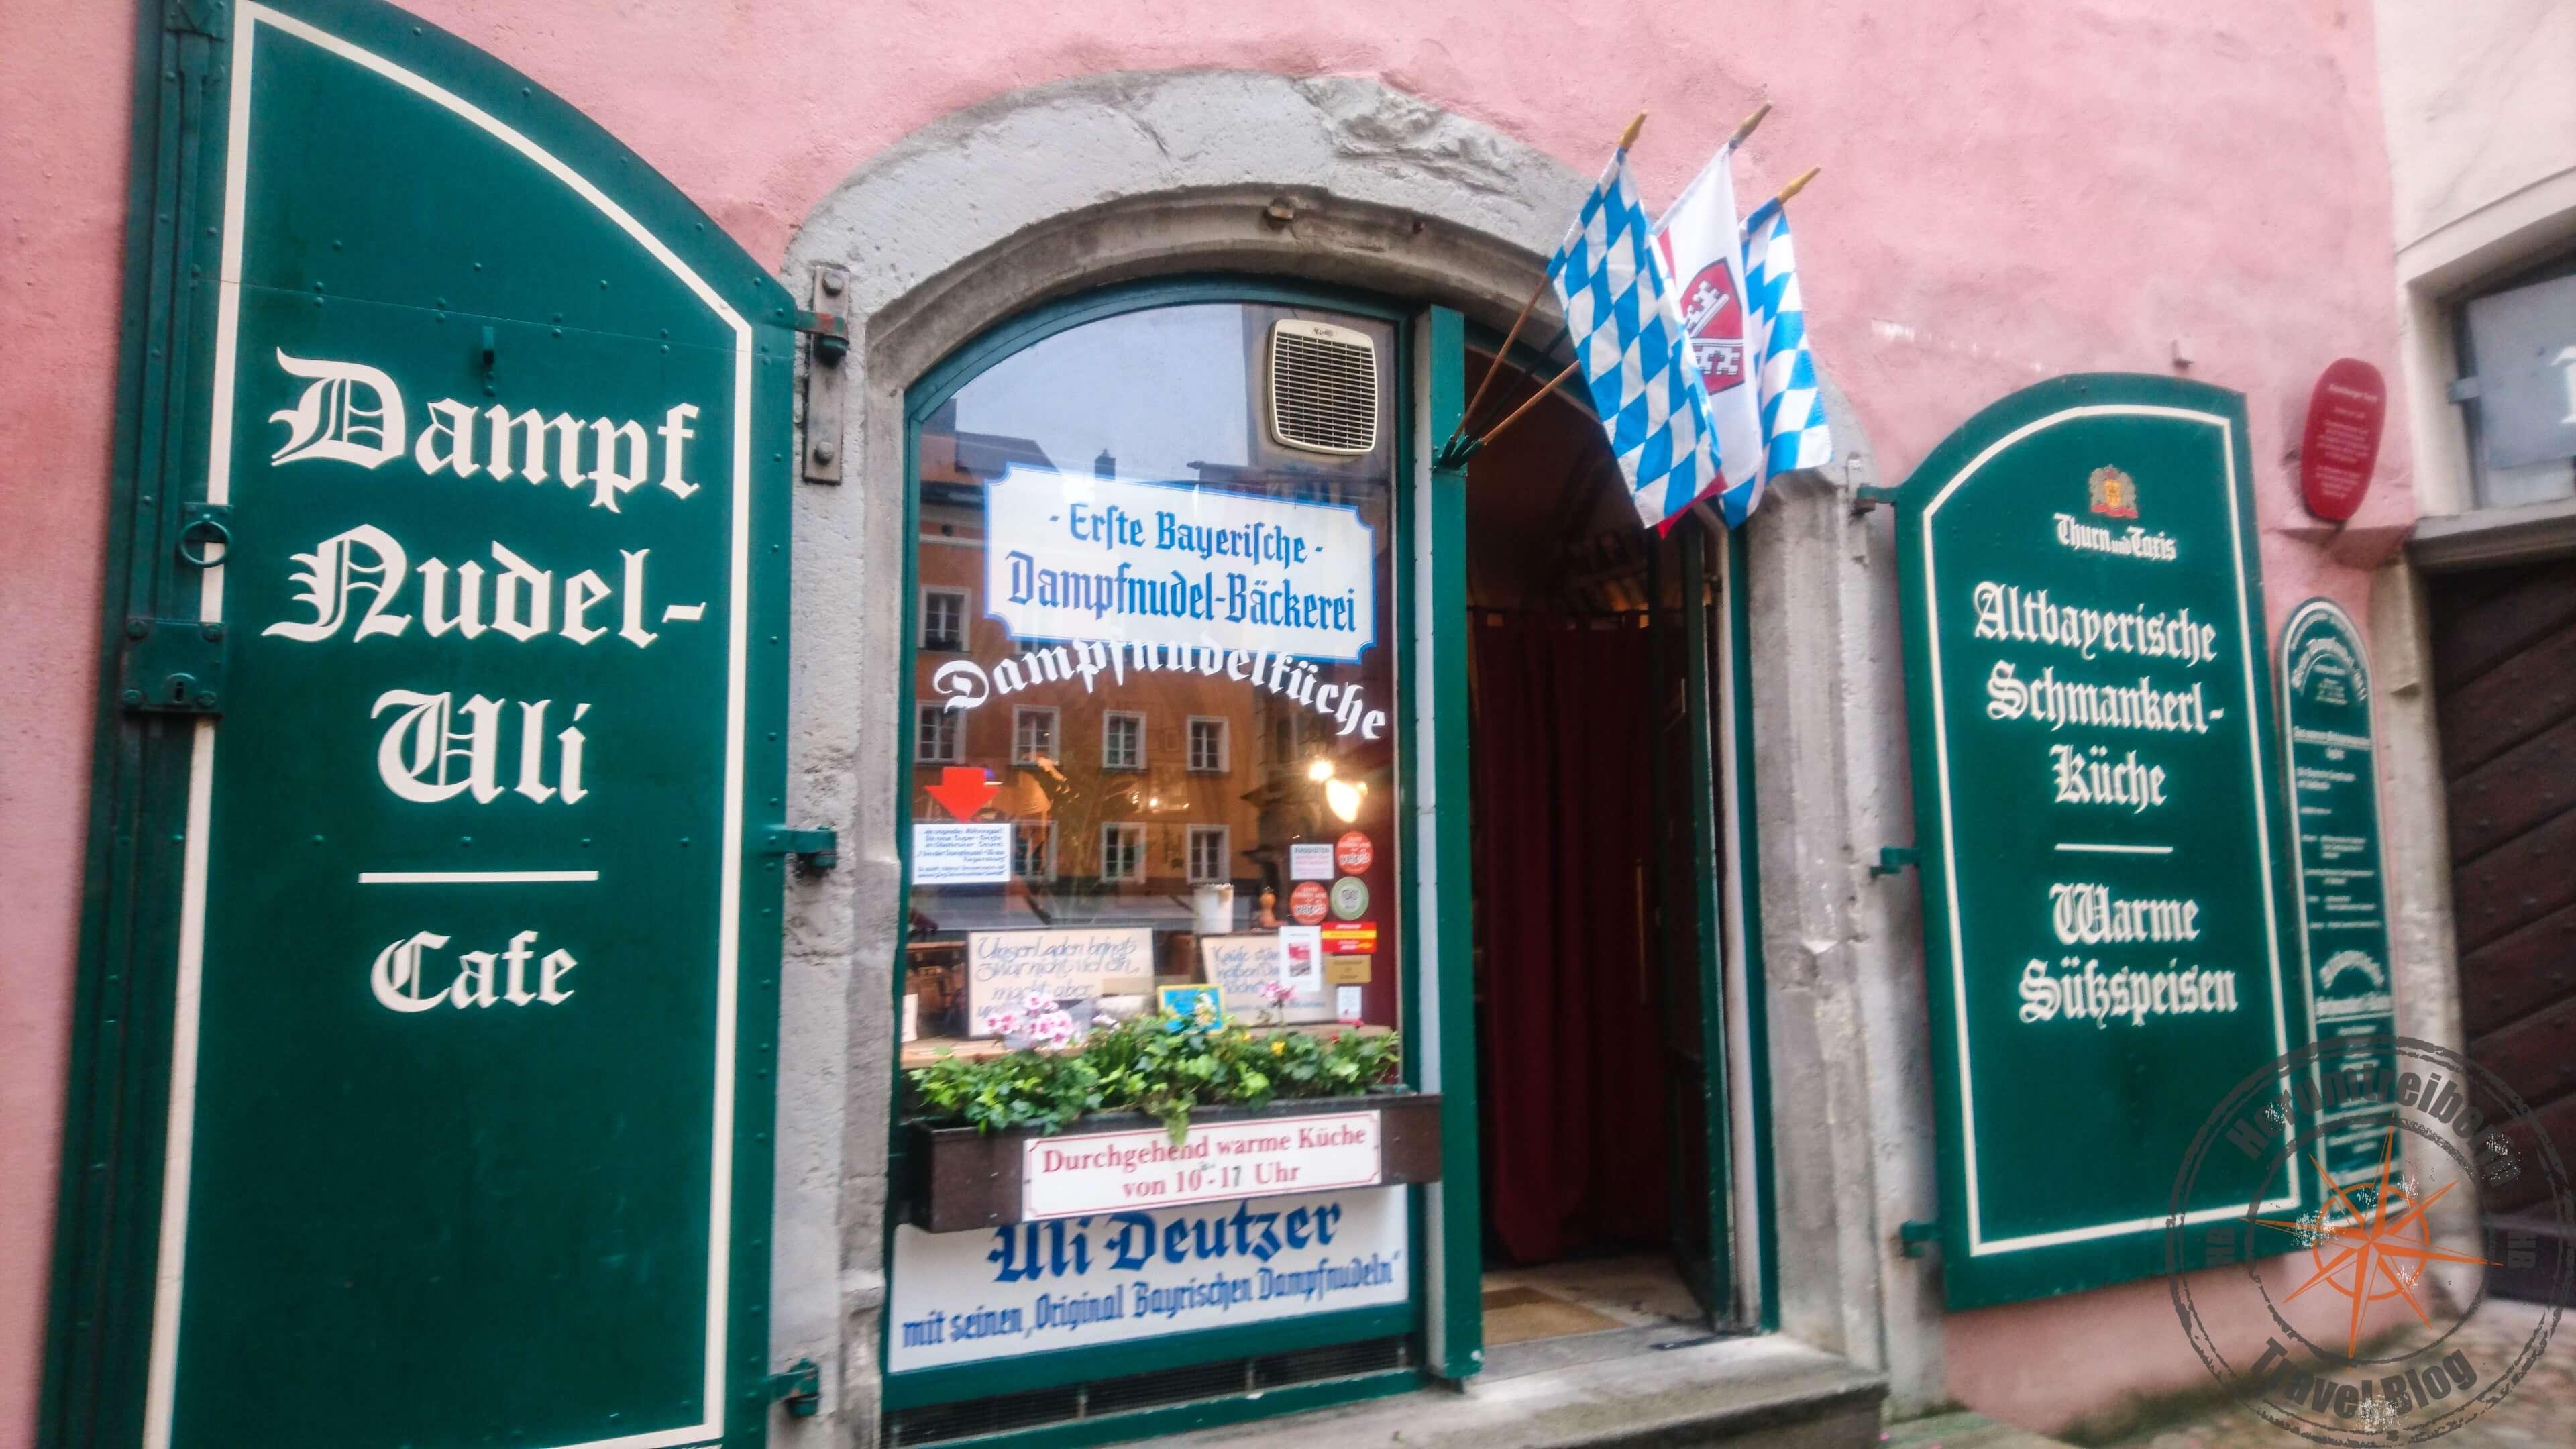 Places to eat in Regensburg, Deutschland - Herumtreiberin